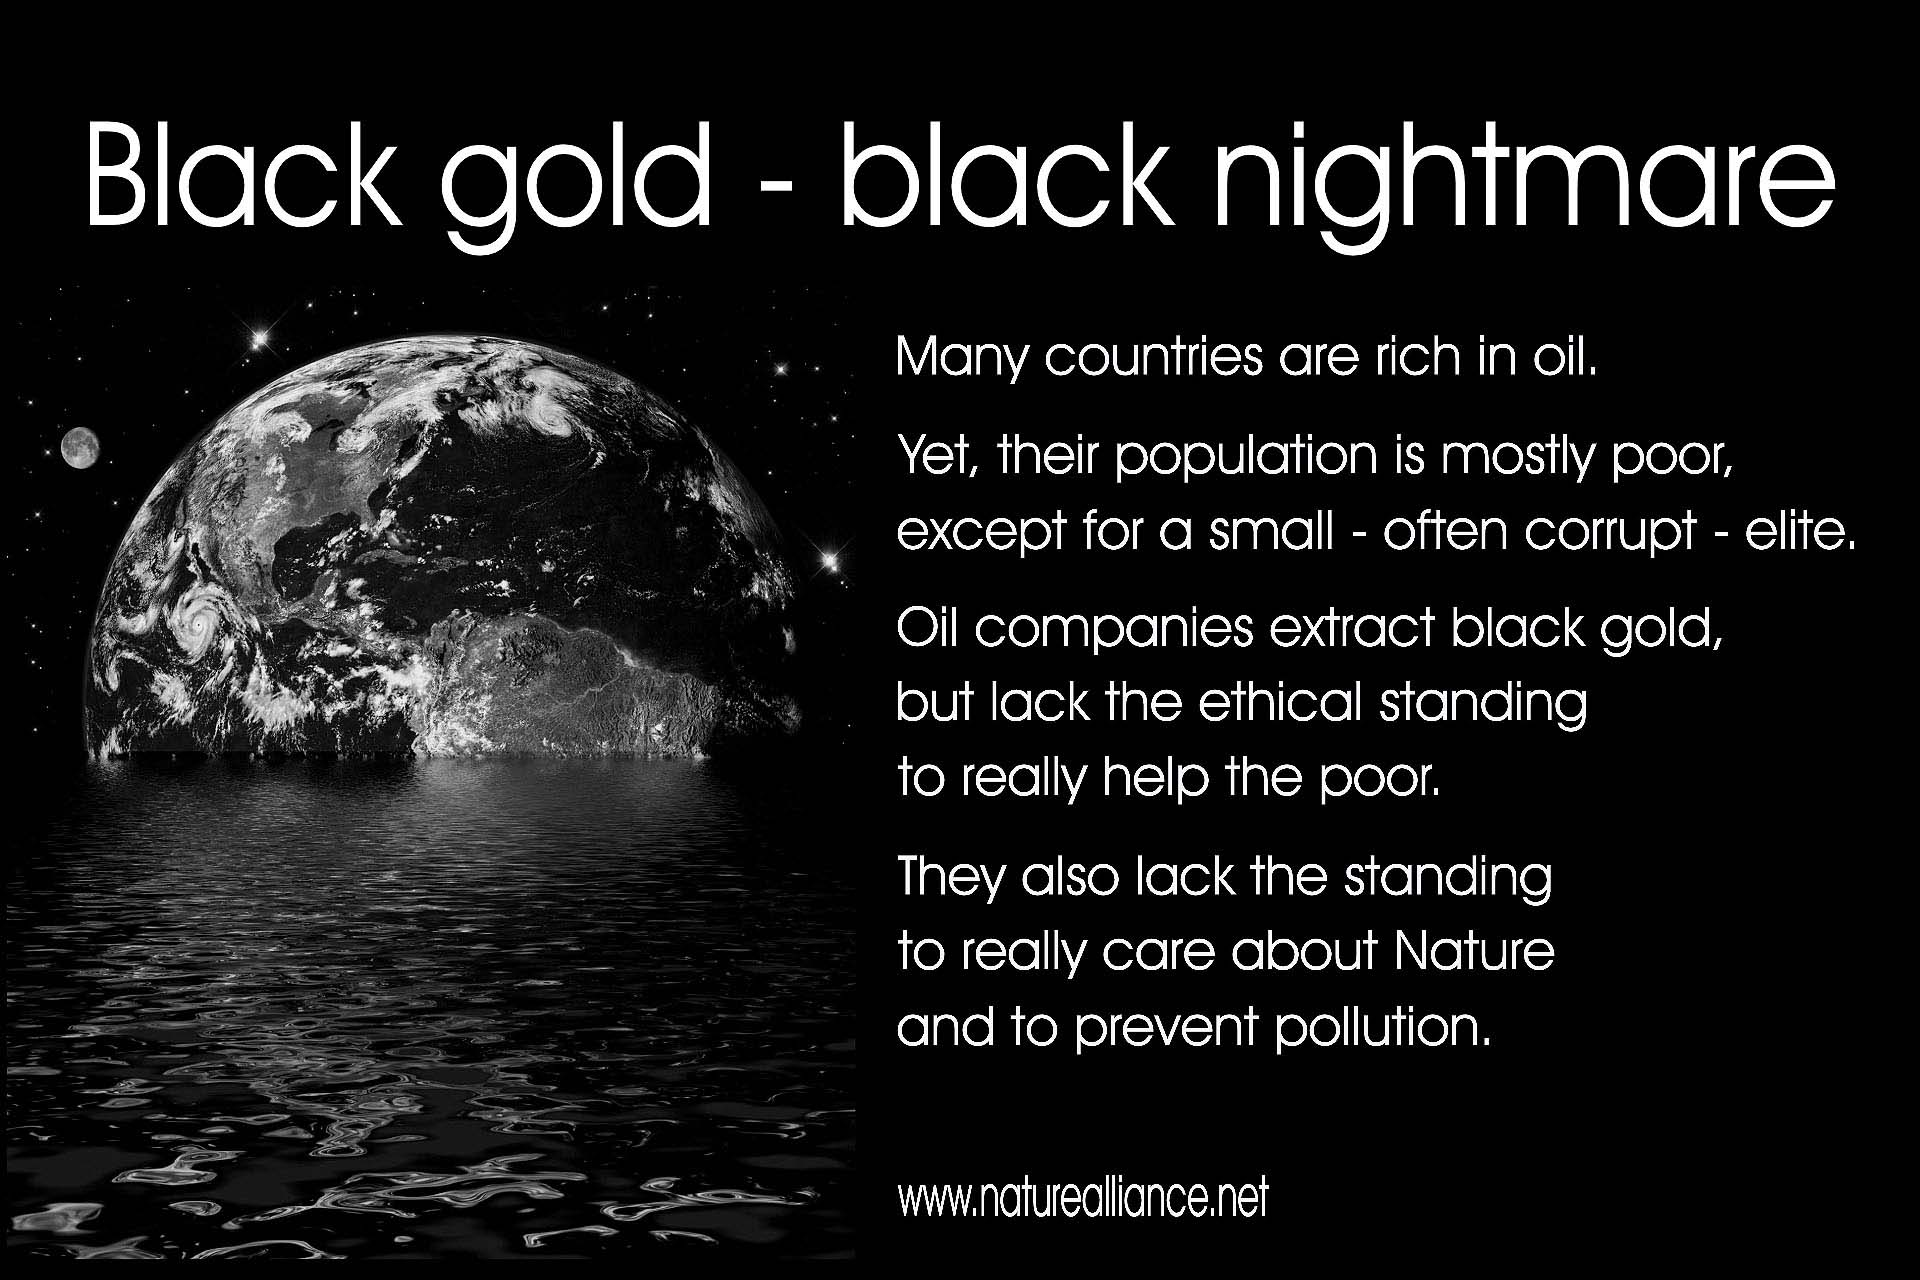 Black gold - black nightmare